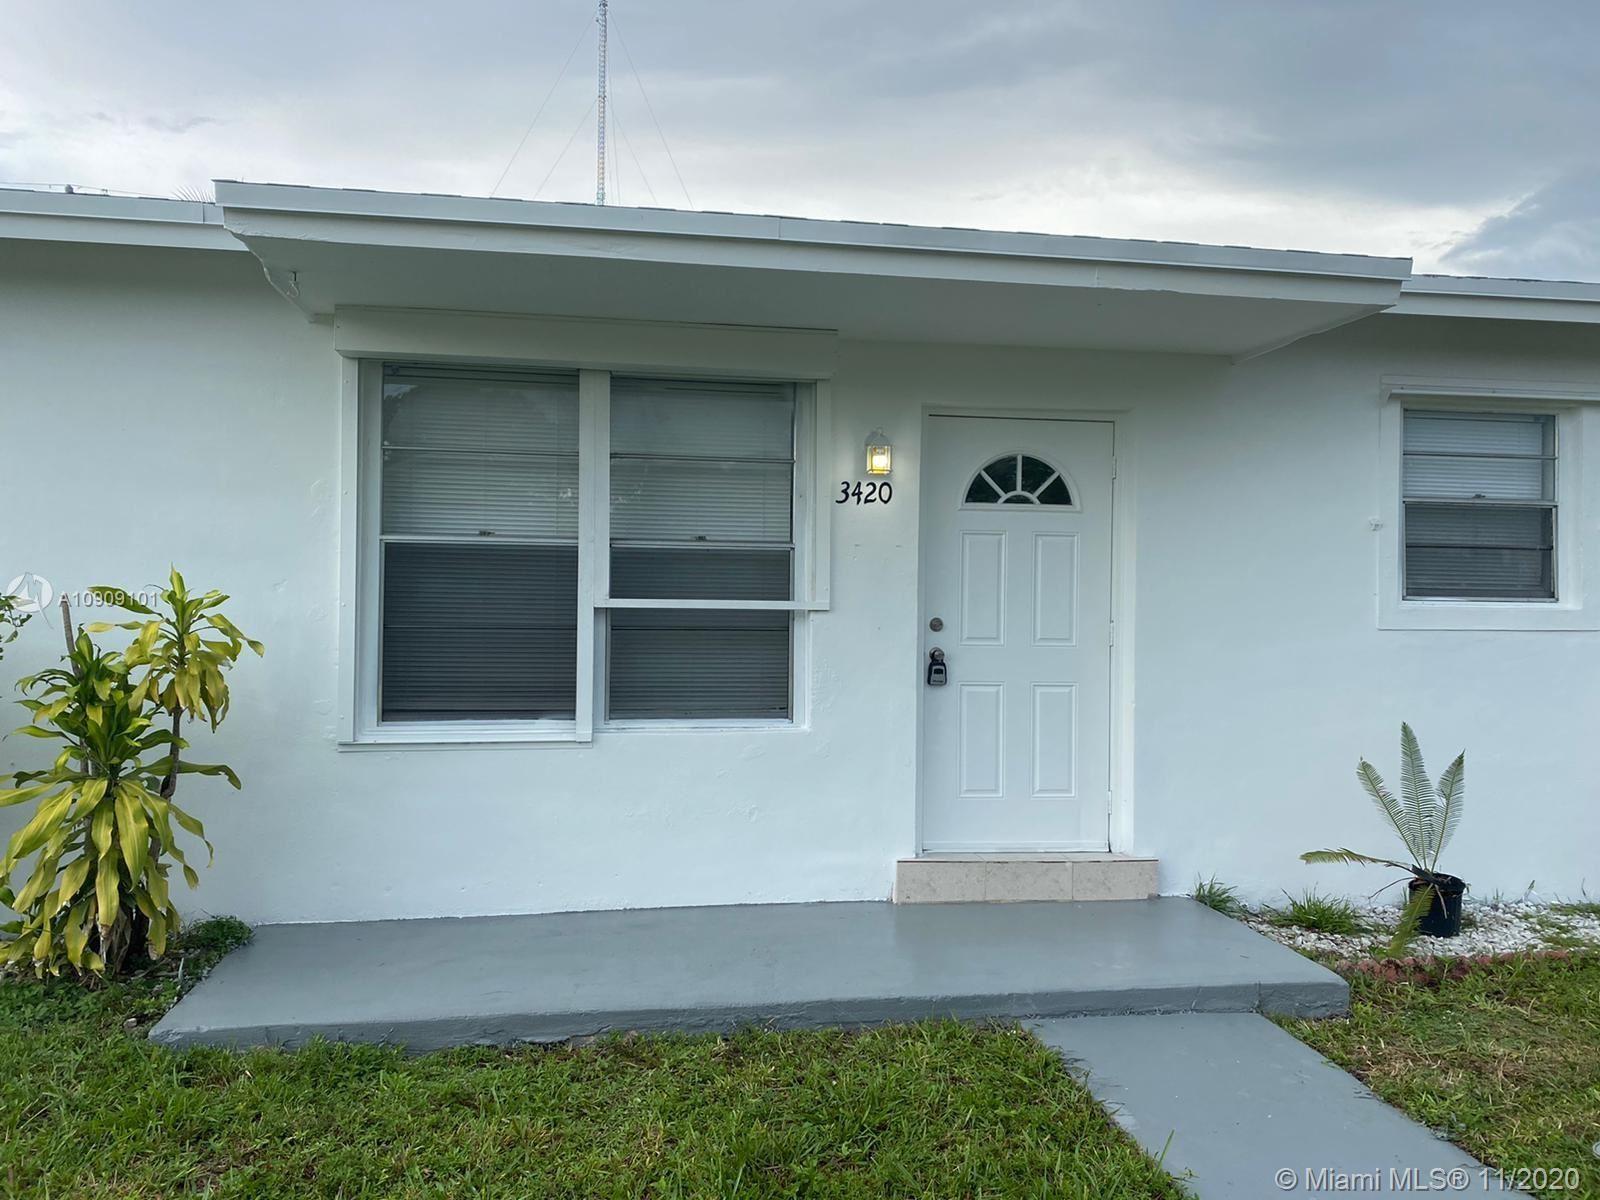 3420 SW 47th Ave, West Park, FL 33023 - #: A10909101